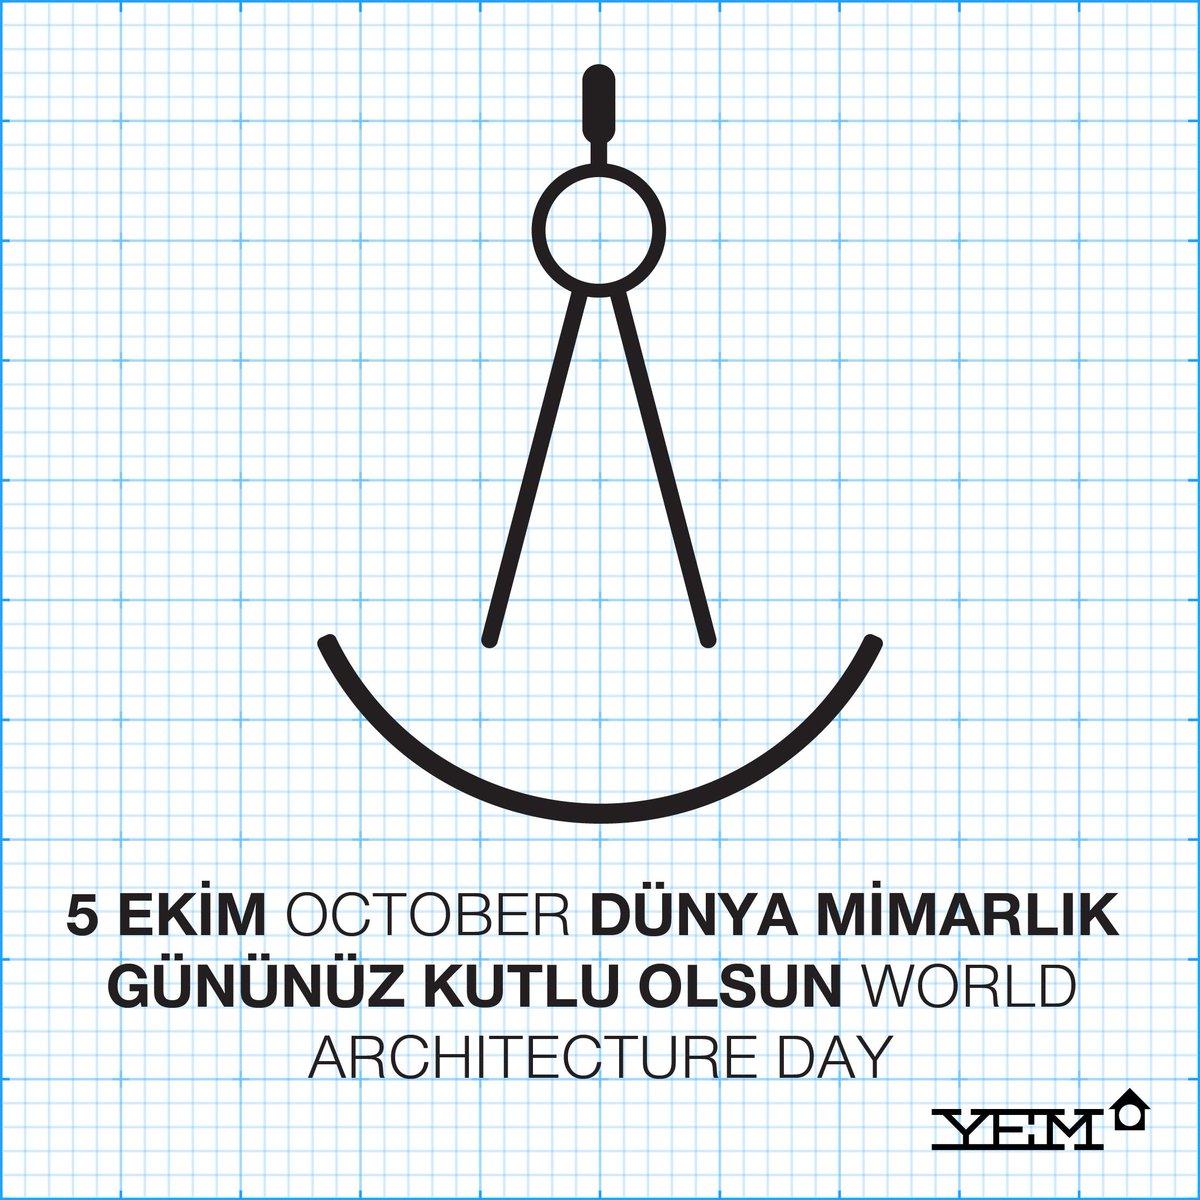 Dünya Mimarlık Gününüz Kutlu Olsun! http://t.co/5qKGA2jvdD